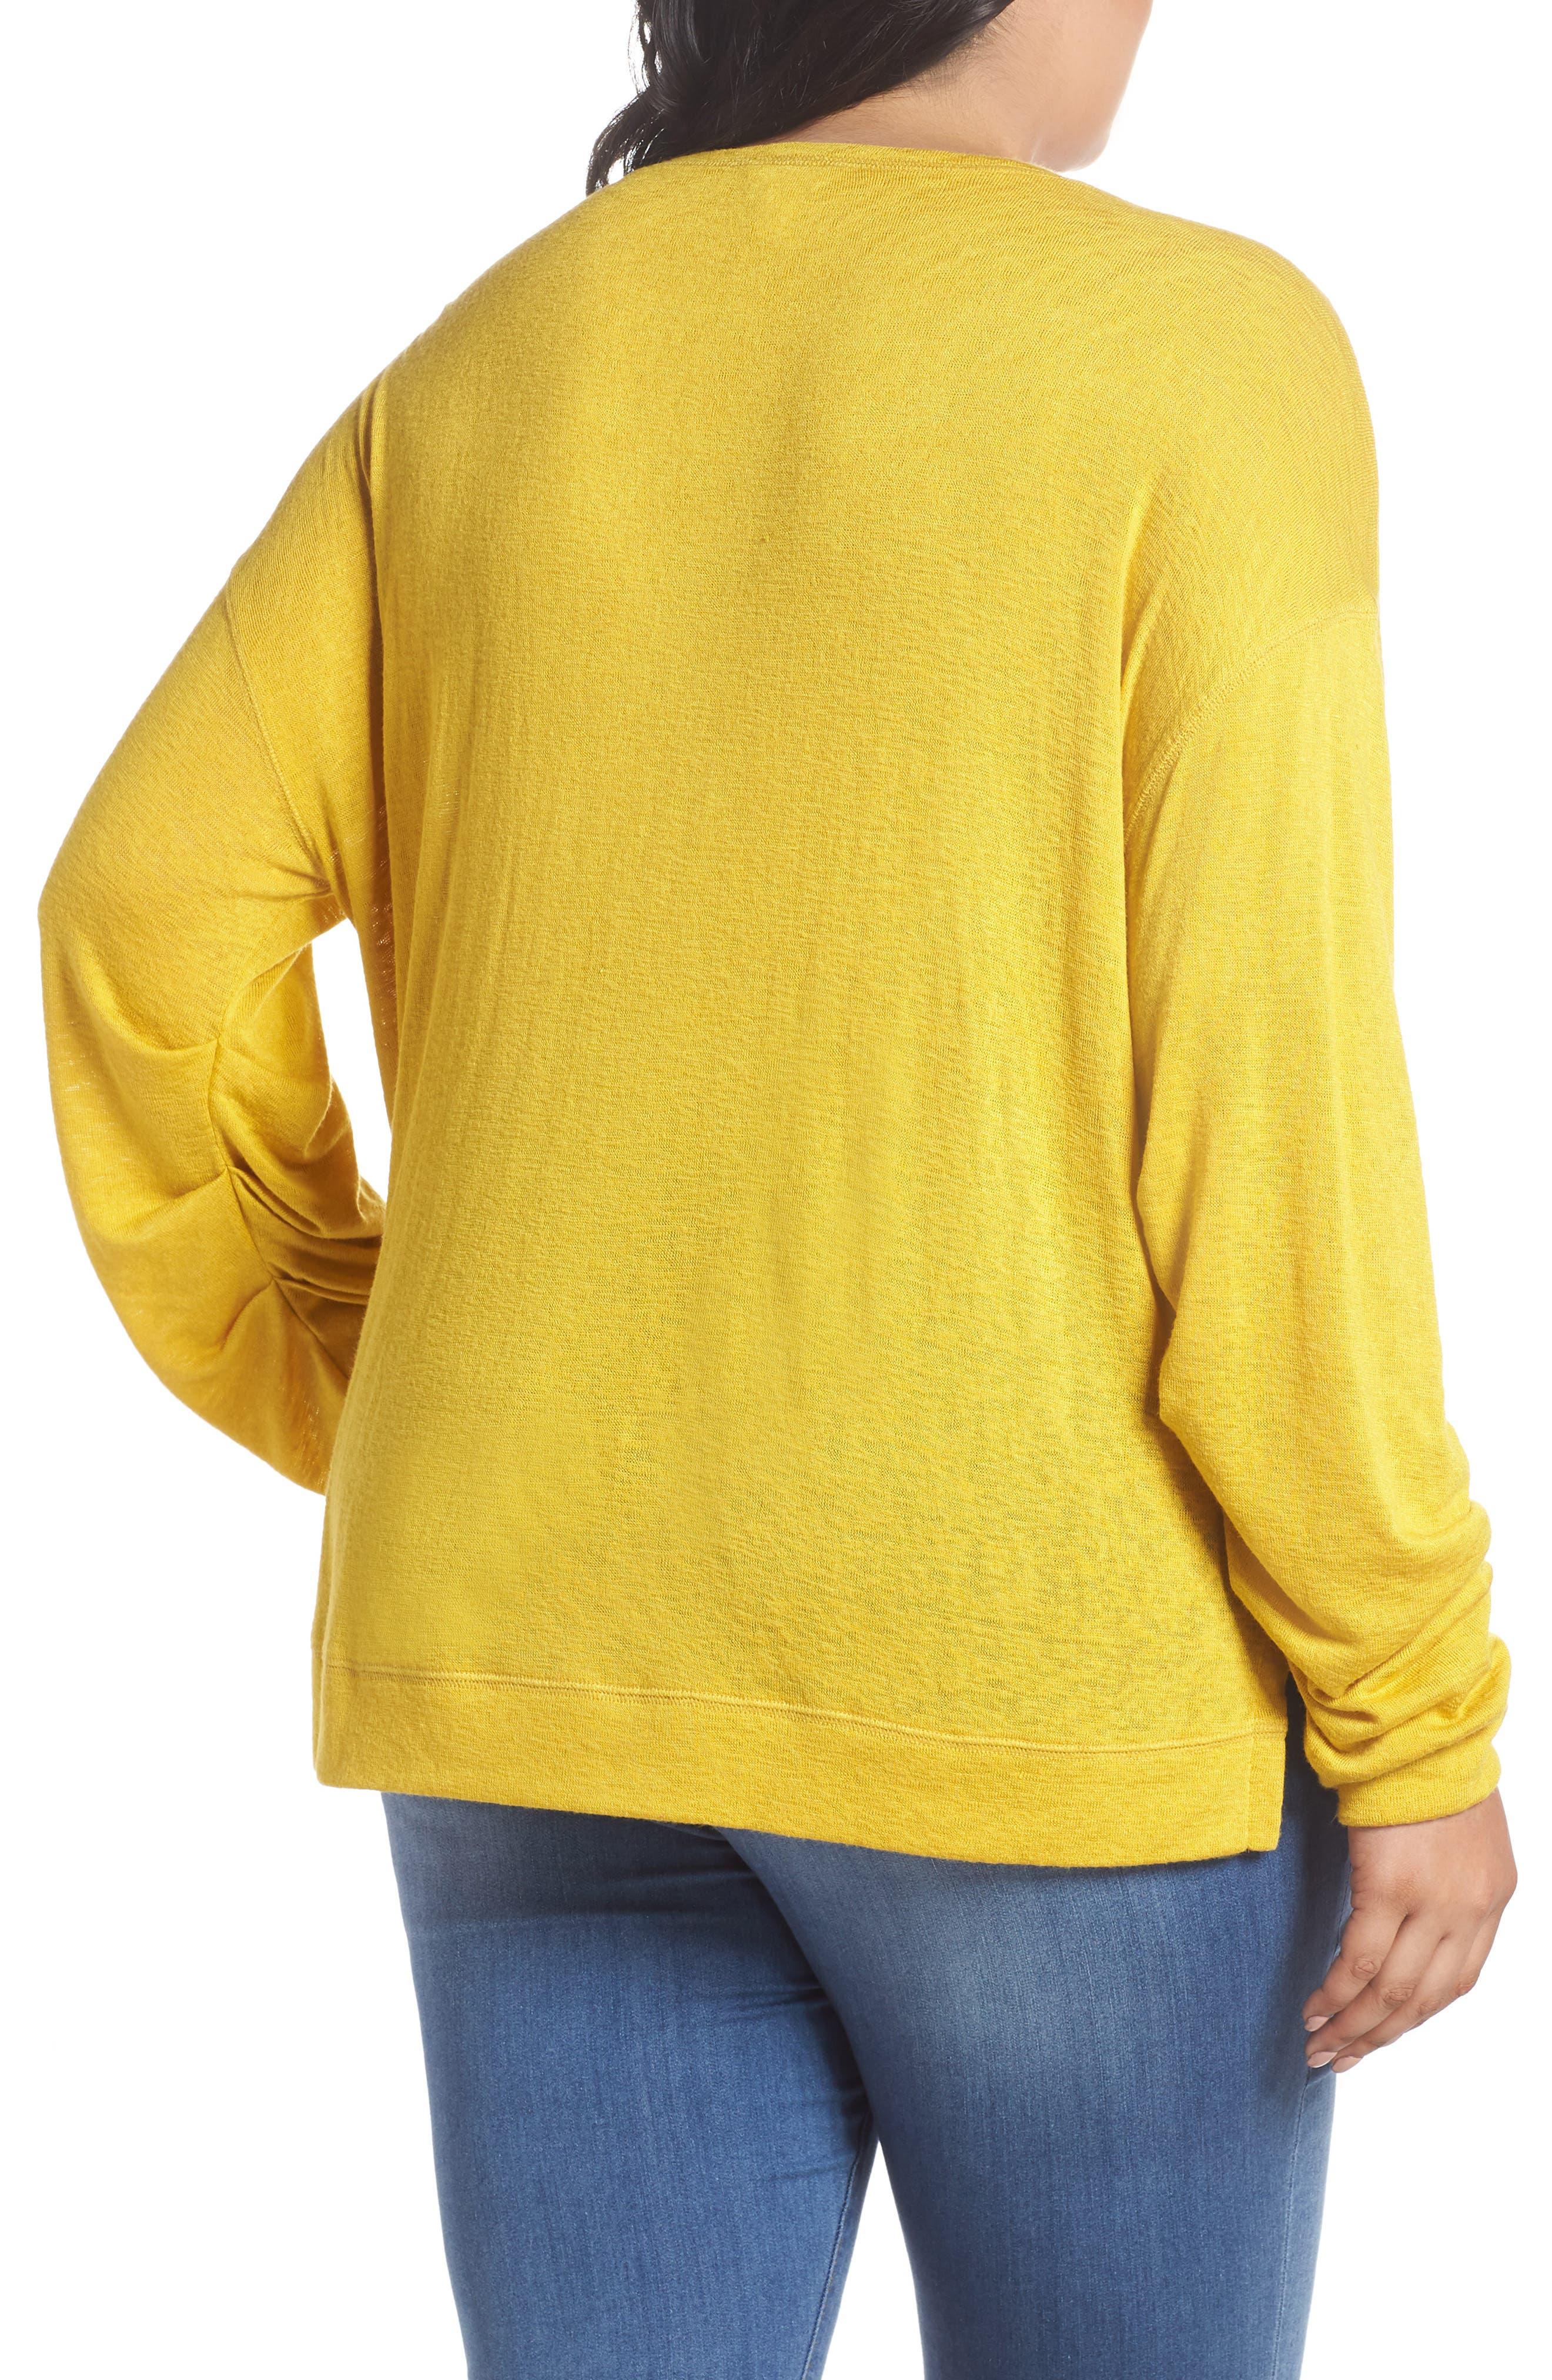 Tuck Sleeve Sweatshirt,                             Alternate thumbnail 2, color,                             Yellow Tea